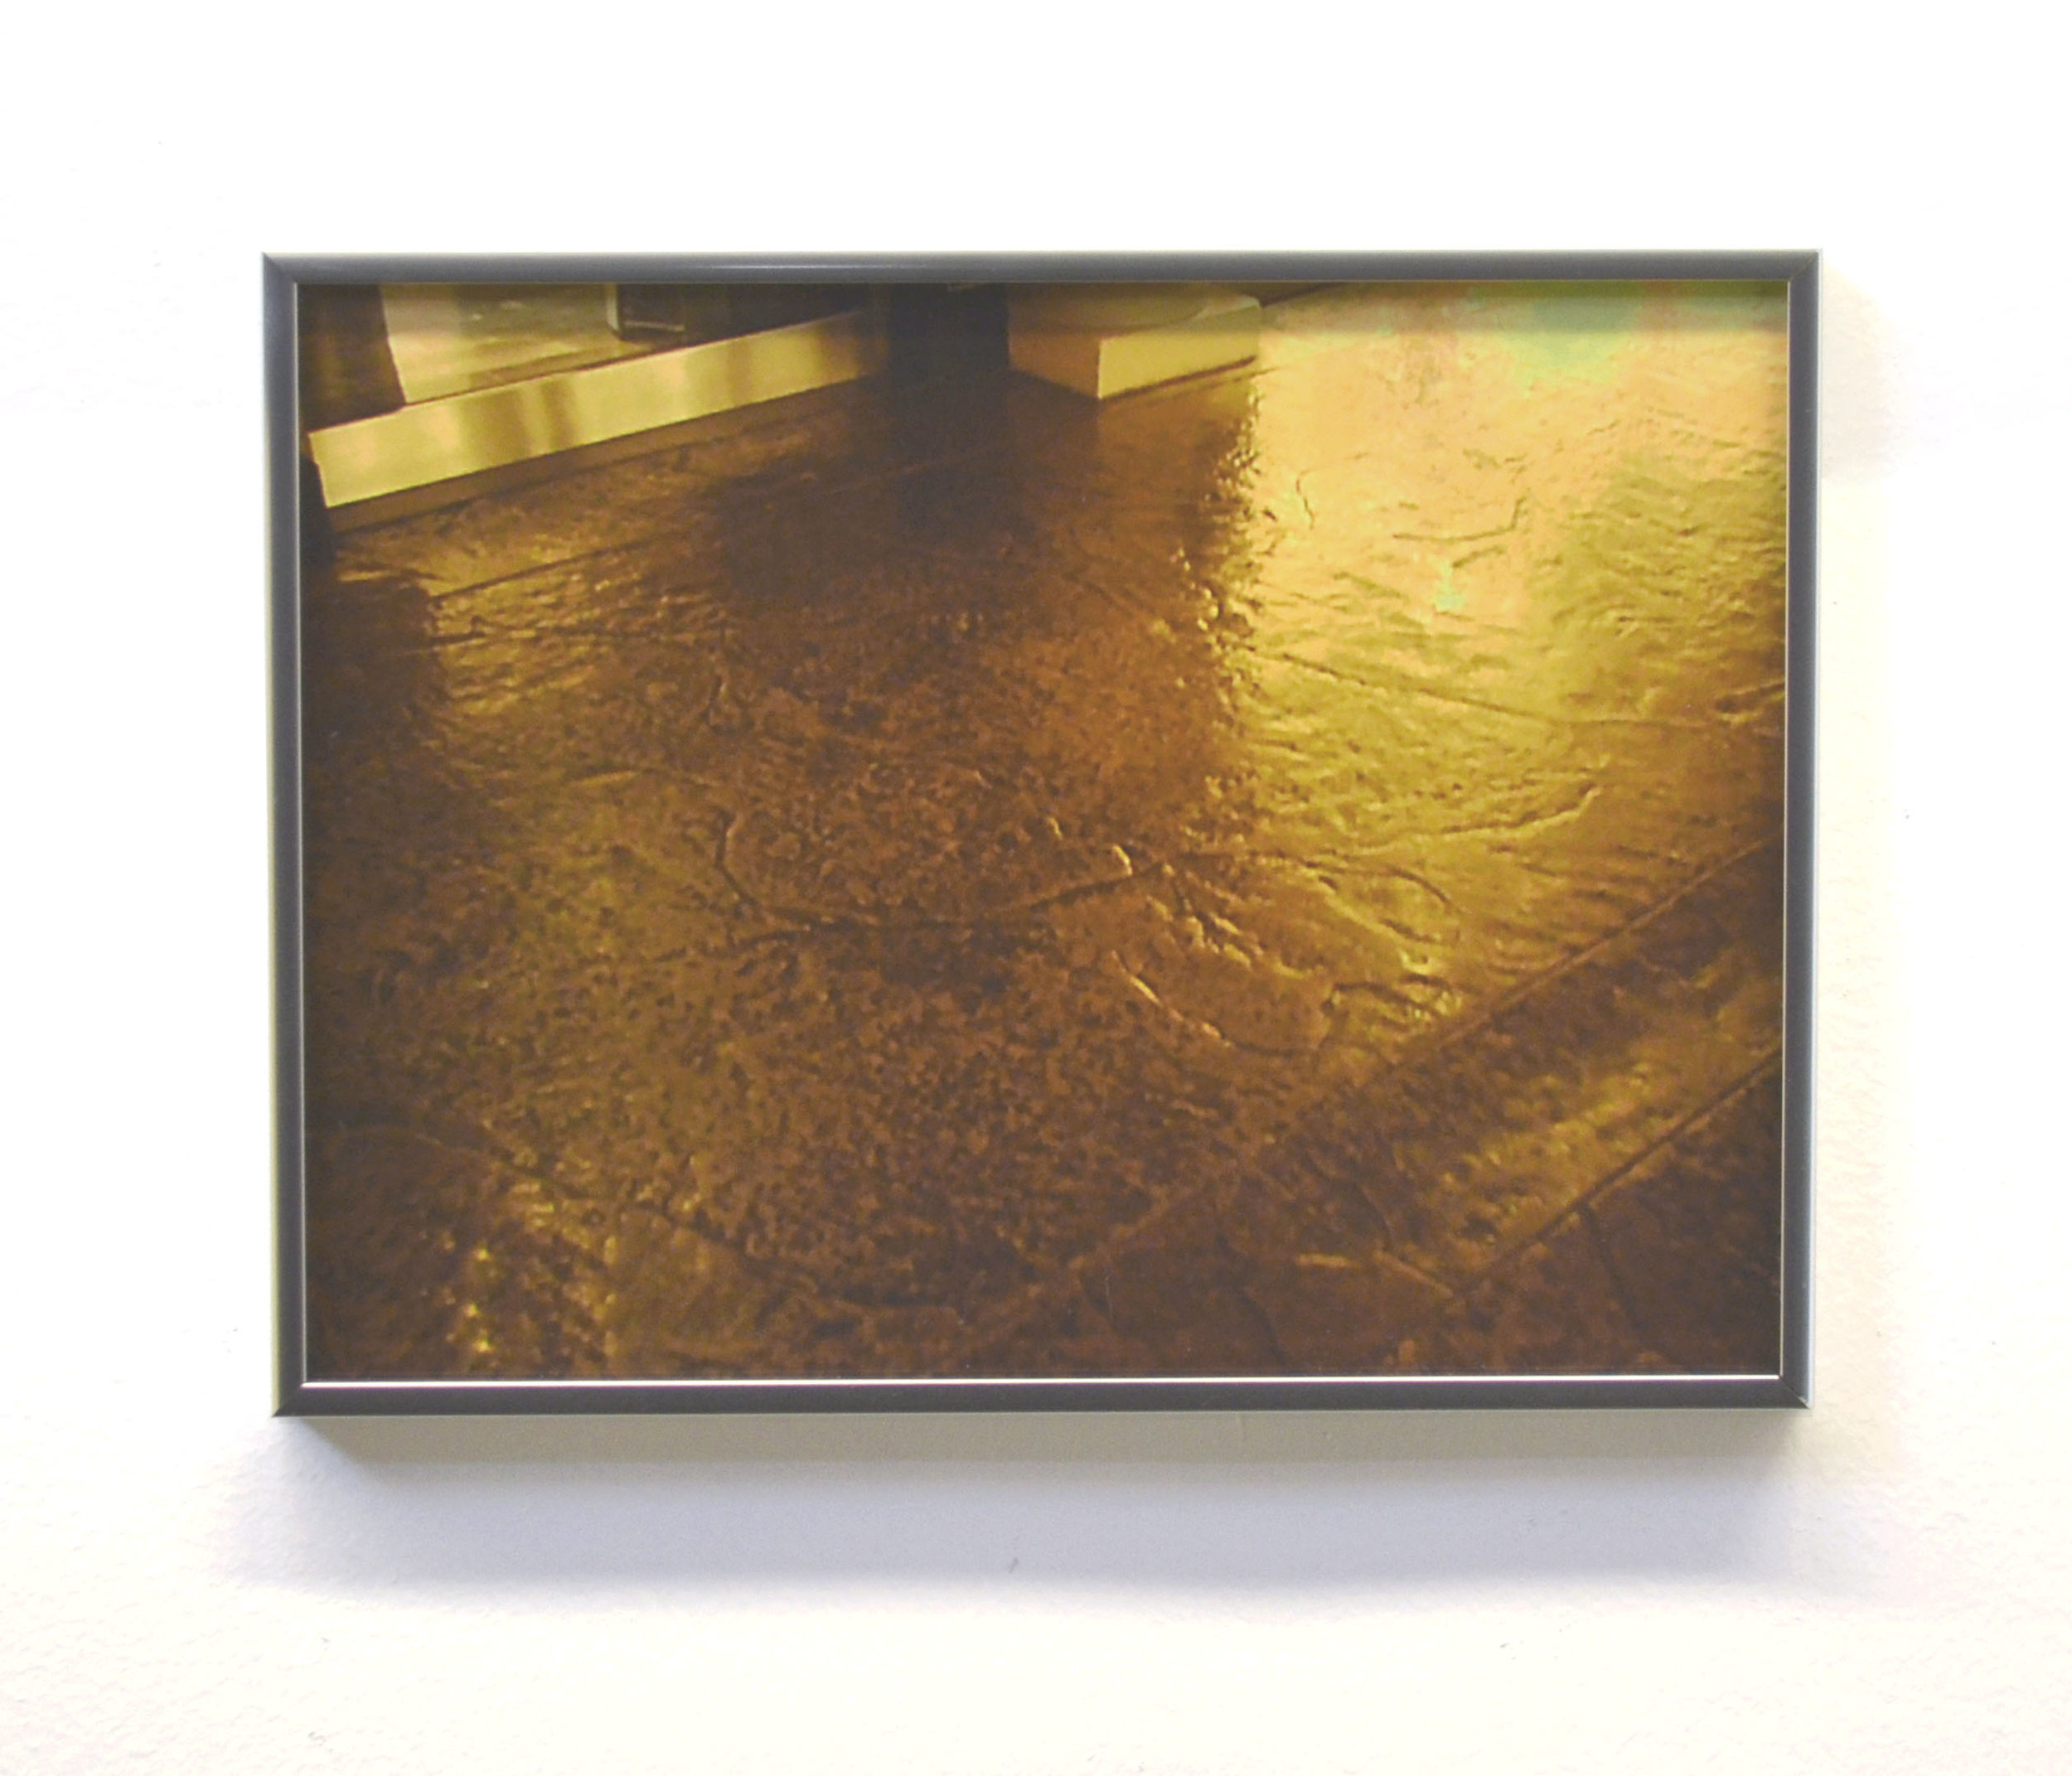 Megan Plunkett, Carpenter, 2018, digital C-print on glossy paper, aluminum frames, 9 × 12 in